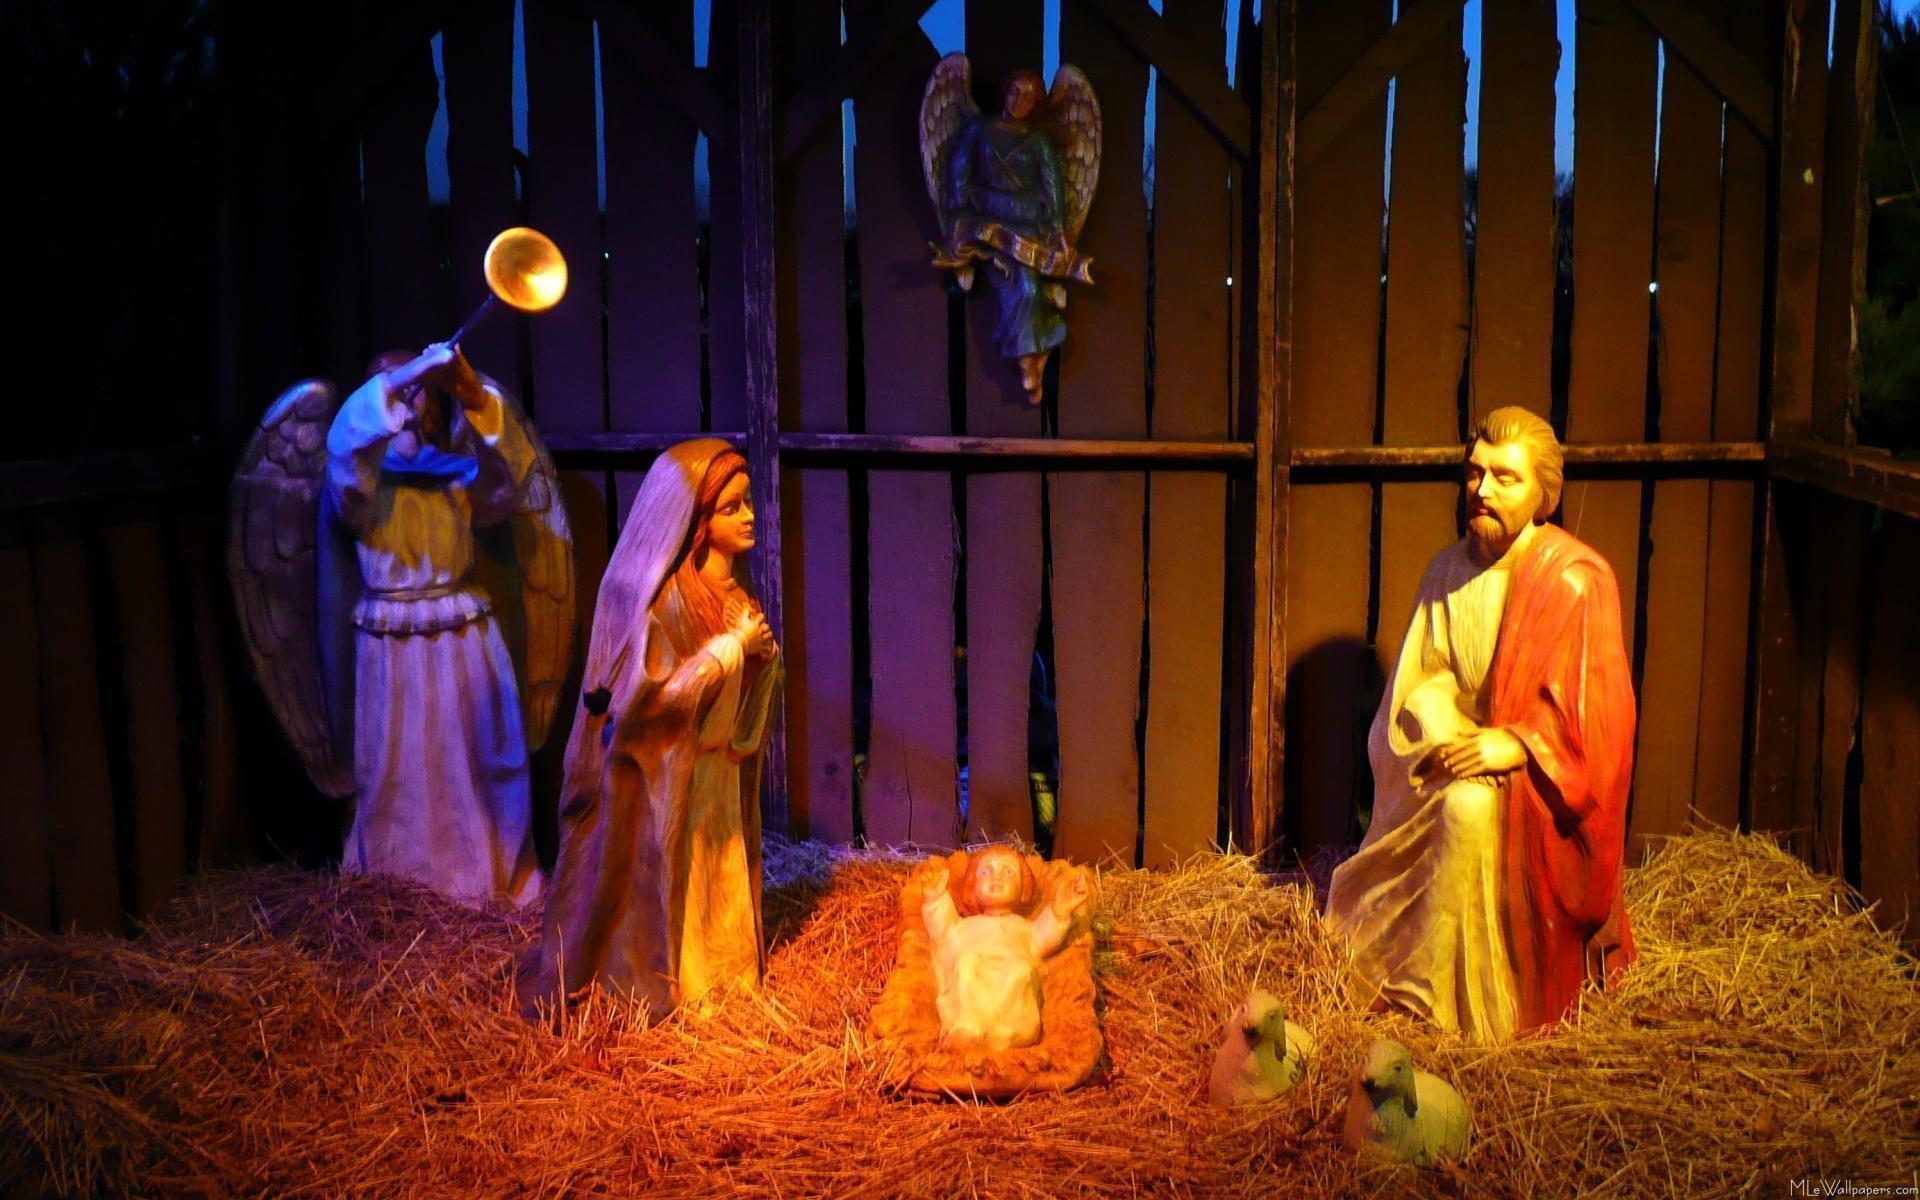 Christmas Nativity Backgrounds 1